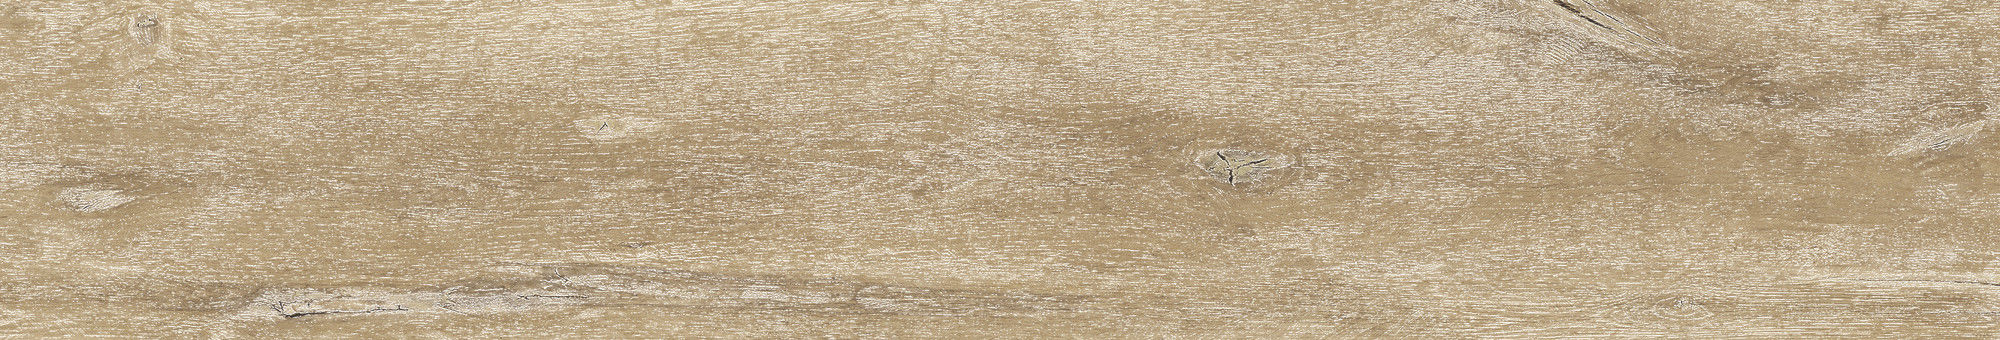 Lenk Honey 24x151 płytki drewnopodobne